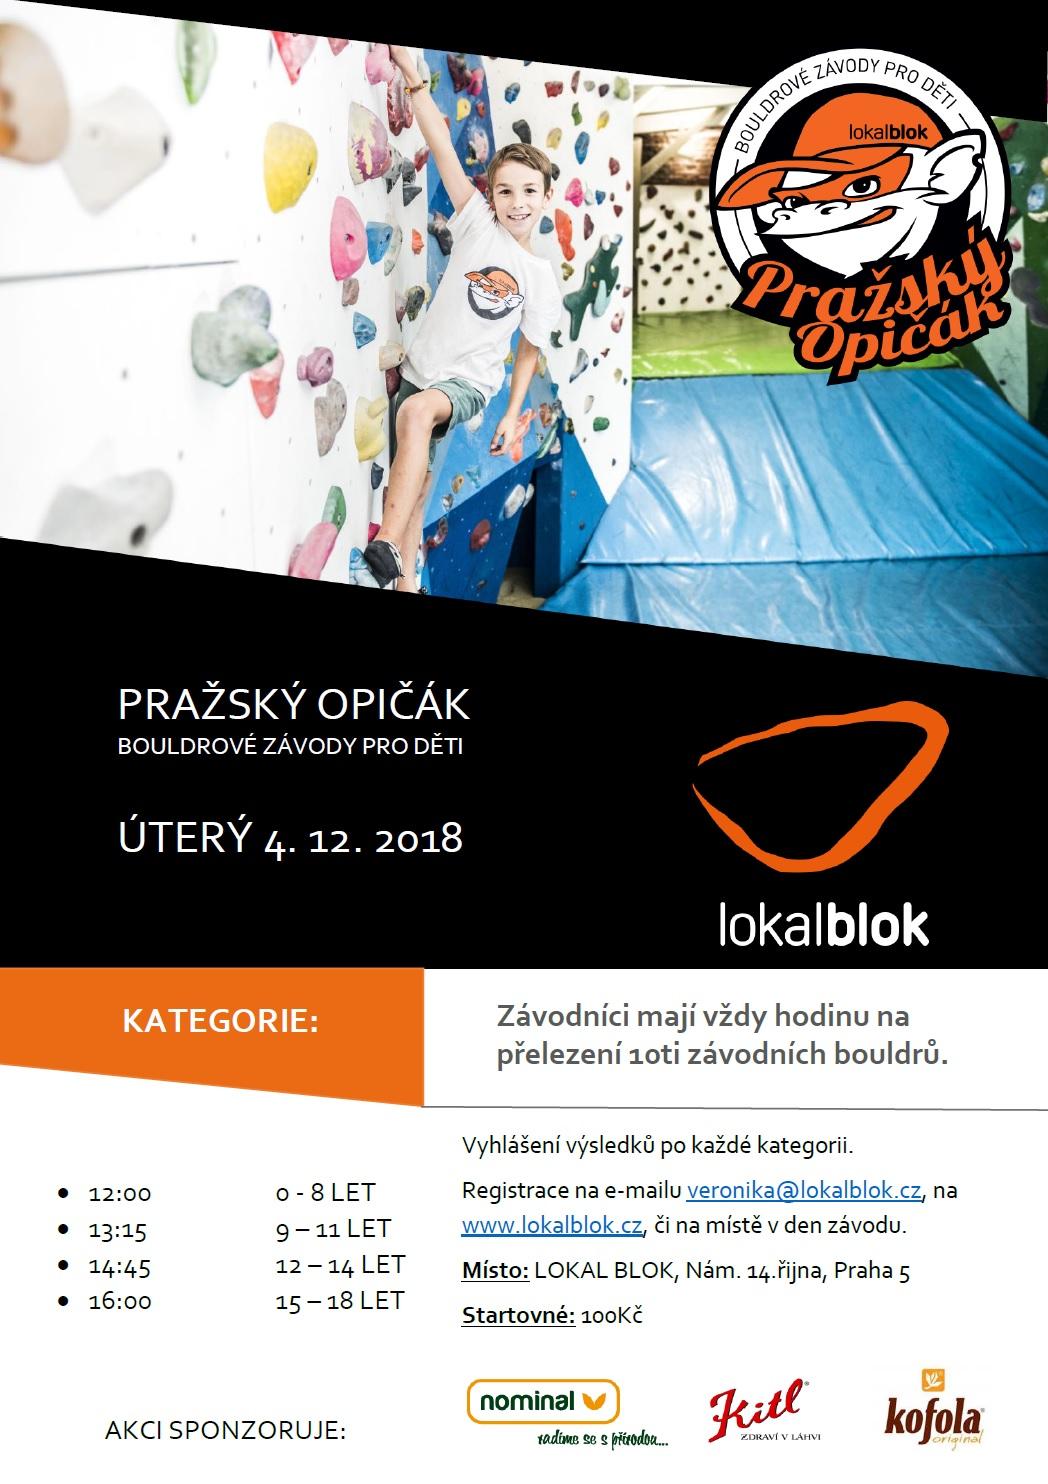 prazsky-opicak-bouldrove-zavody-pro-deti